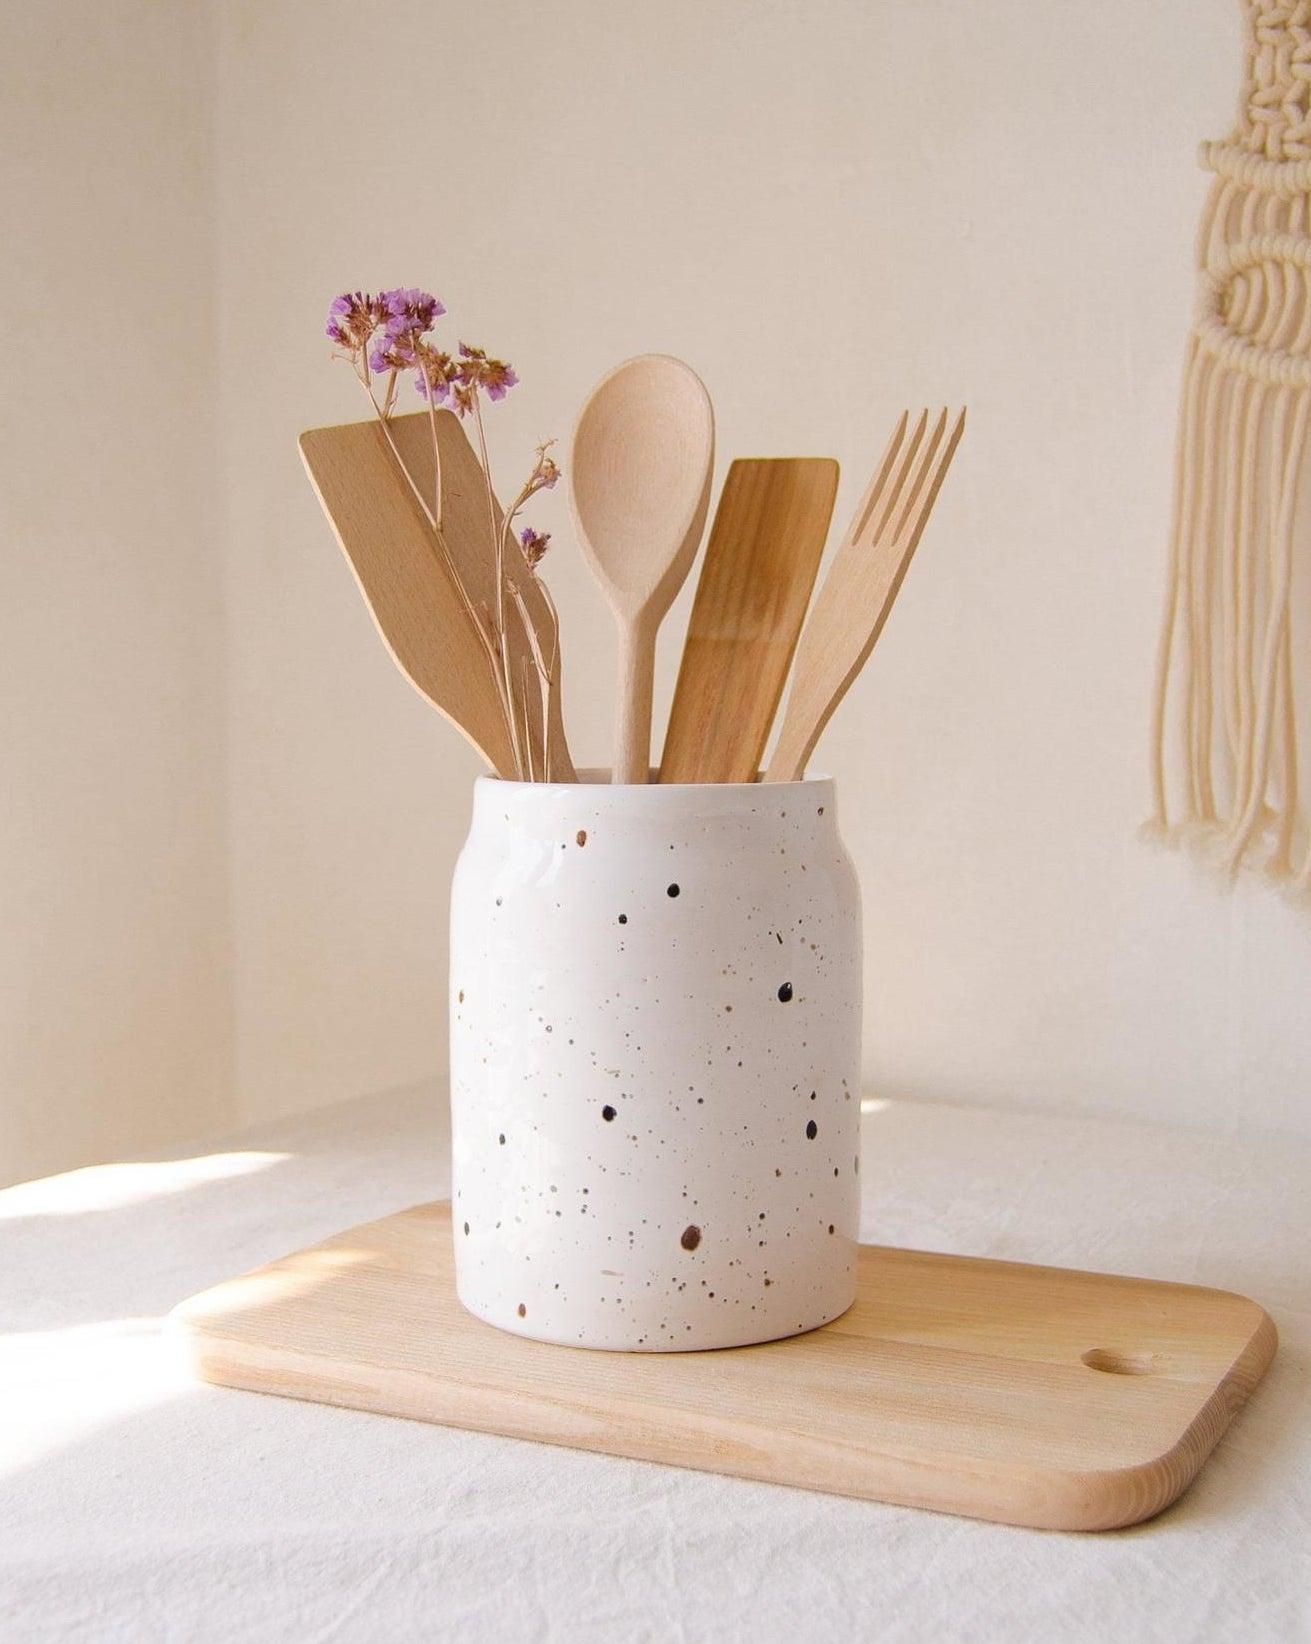 wooden utensils in a white speckled stoneware crock